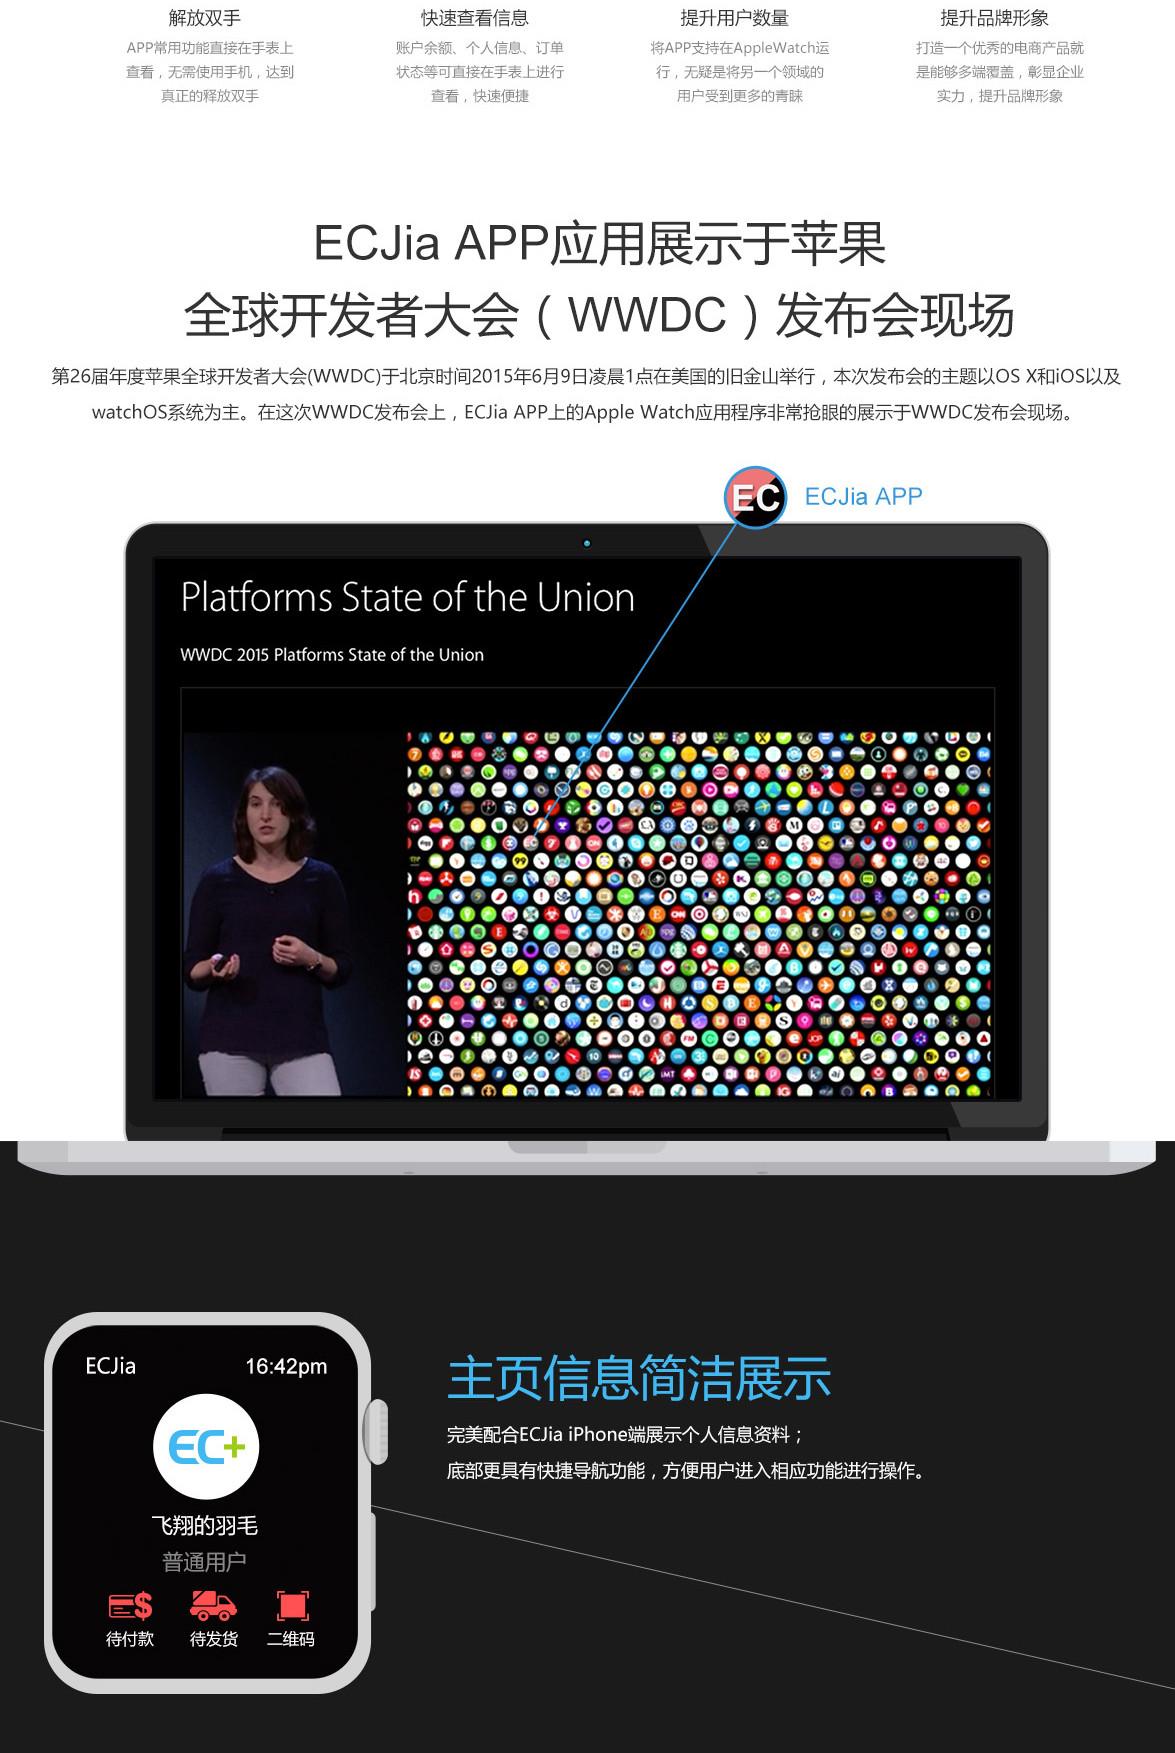 ECJia-AppleWatch-专题页截图2.jpg